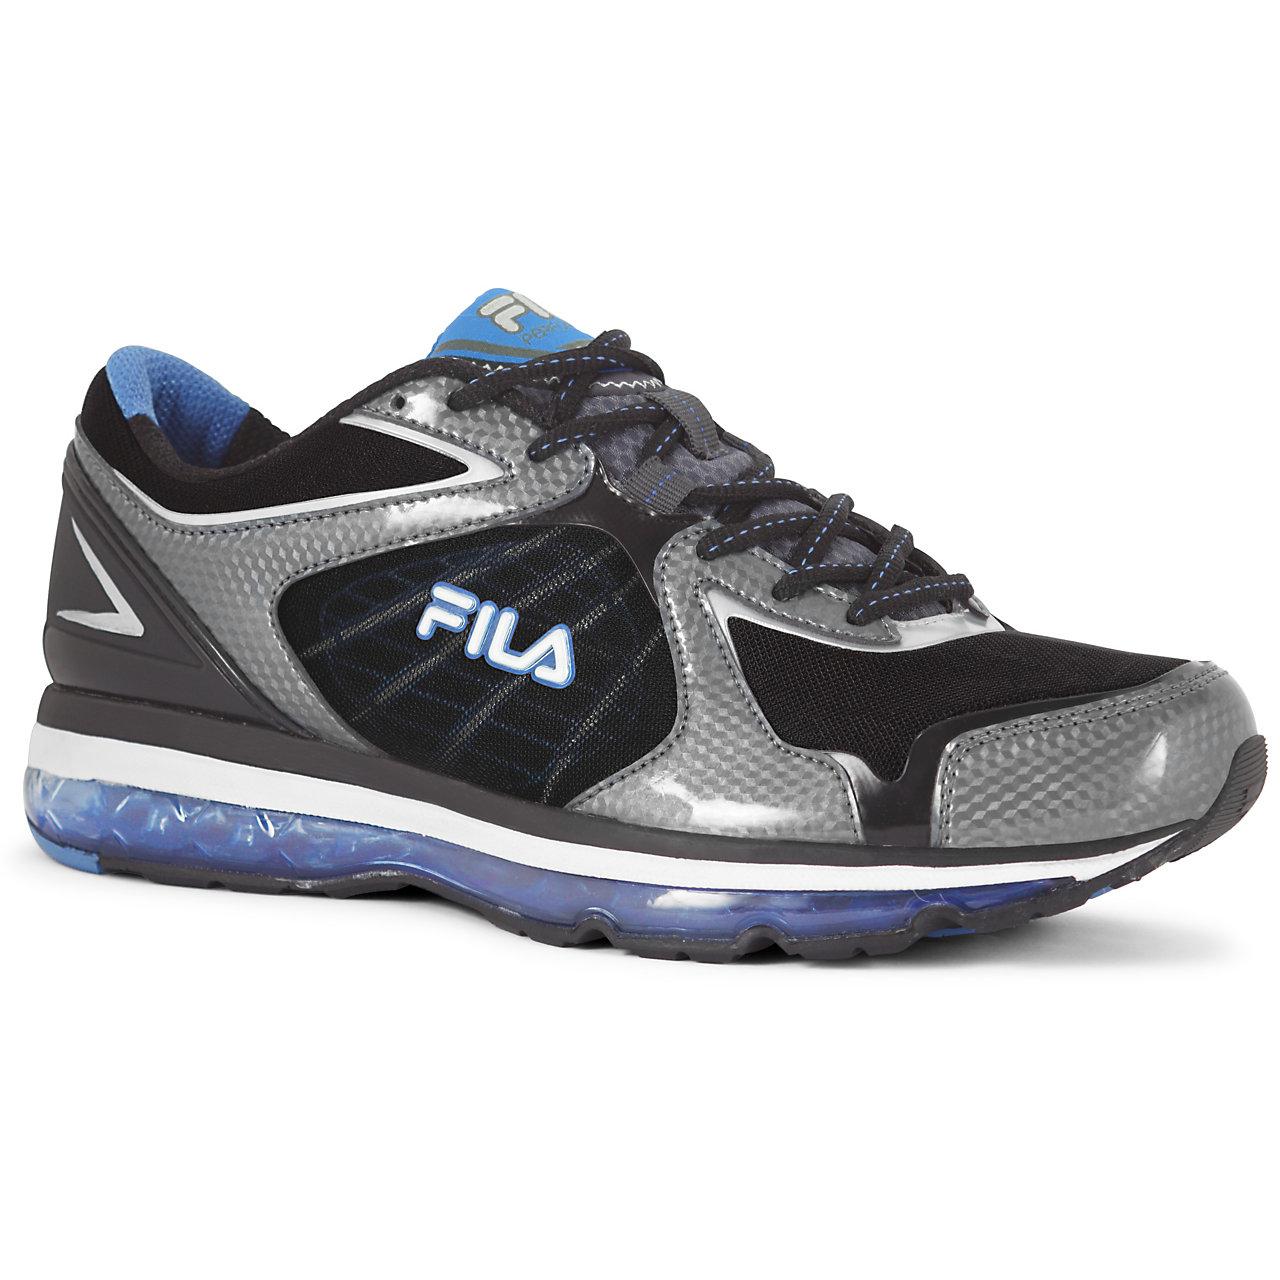 FILA-Mens-Running-DLS-Loop-Shoes